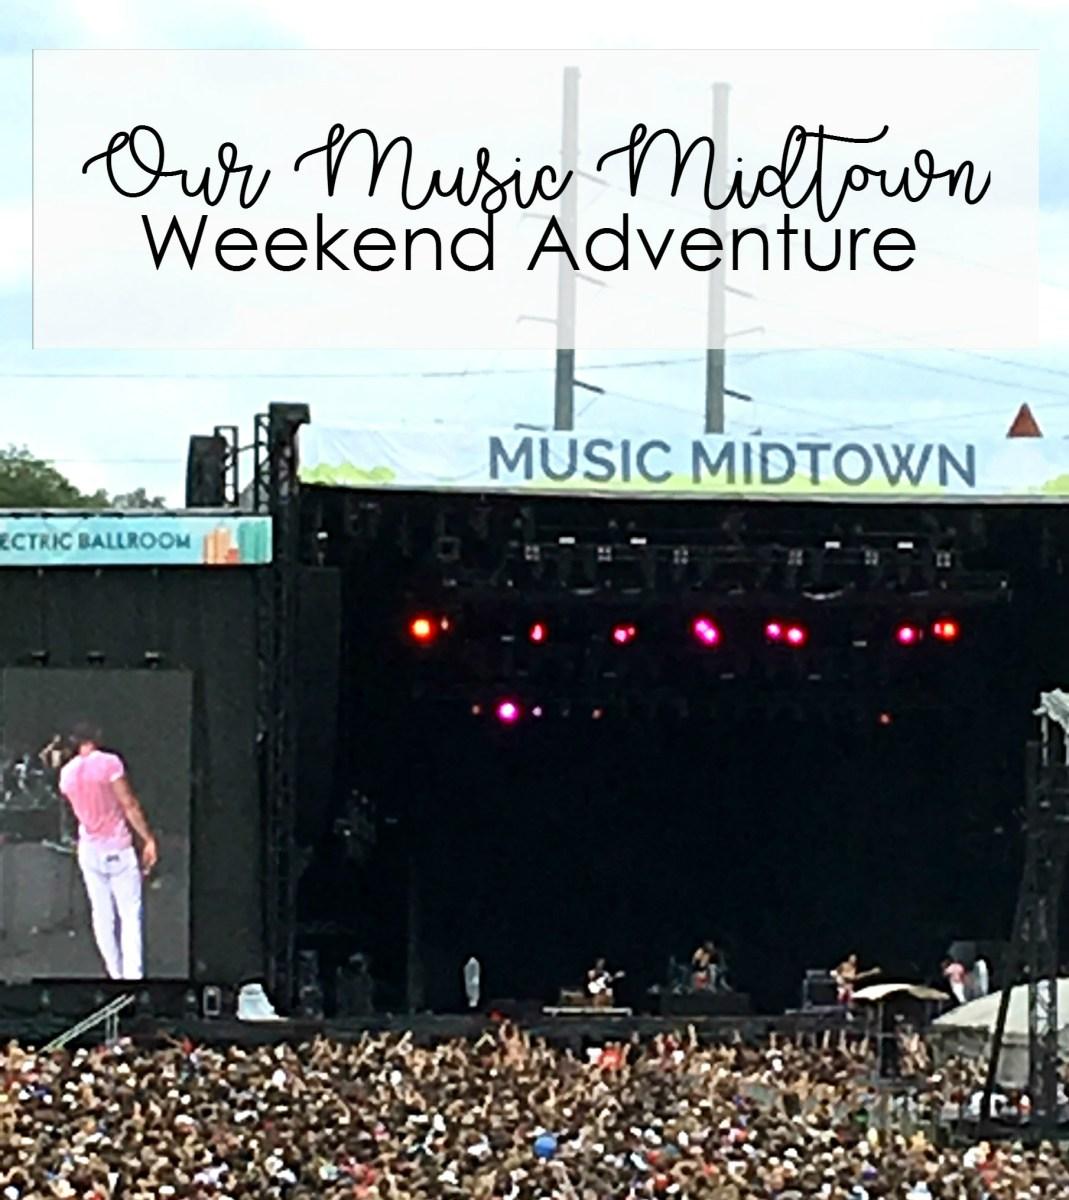 Our Music Midtown weekend adventure